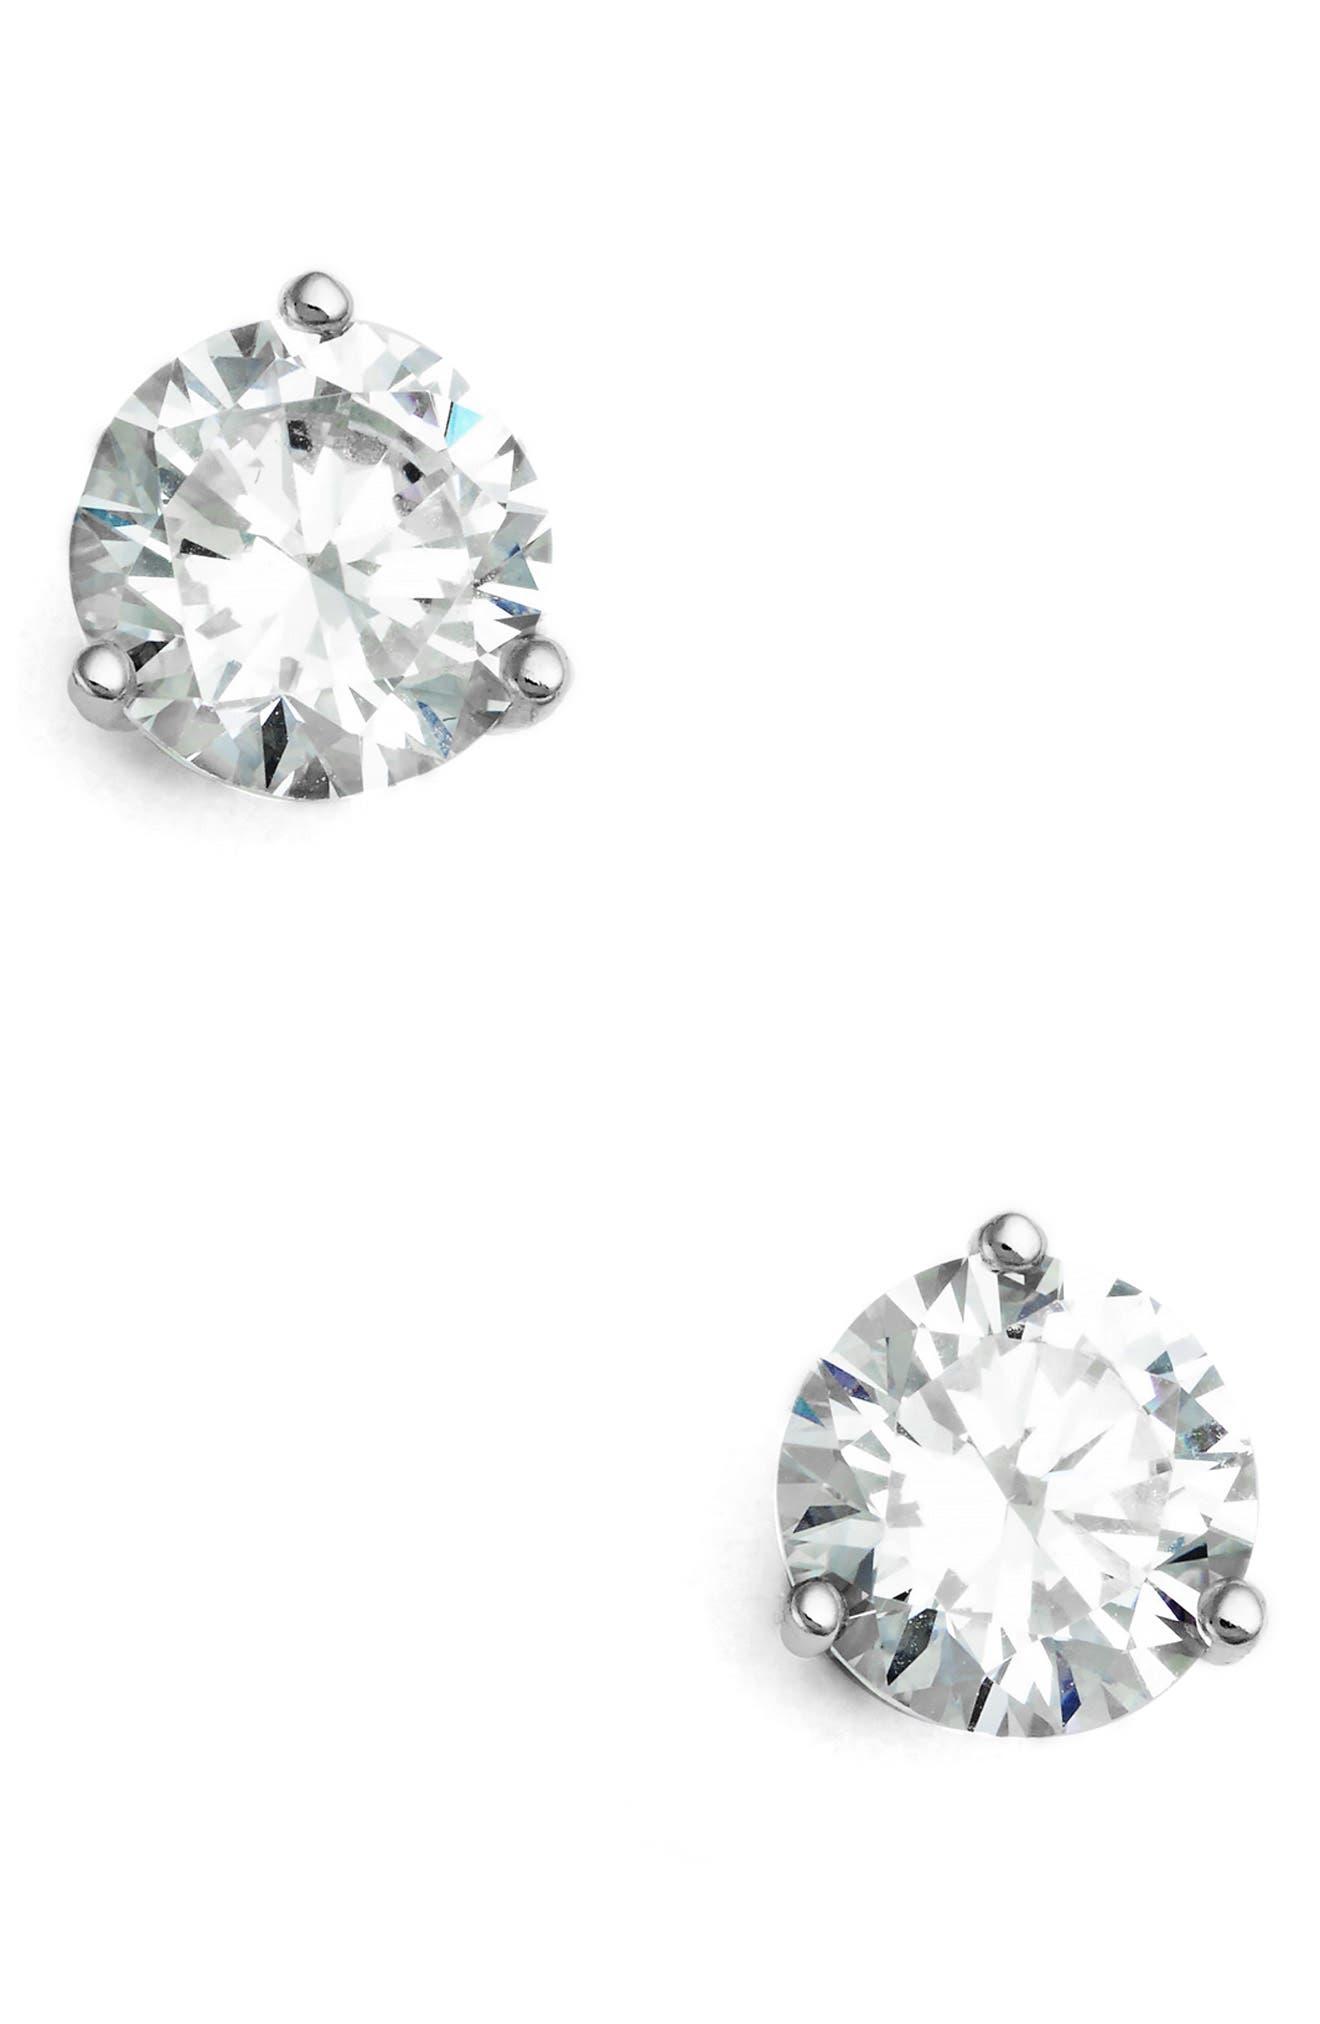 2ct tw Cubic Zirconia Earrings,                             Main thumbnail 1, color,                             PLATINUM